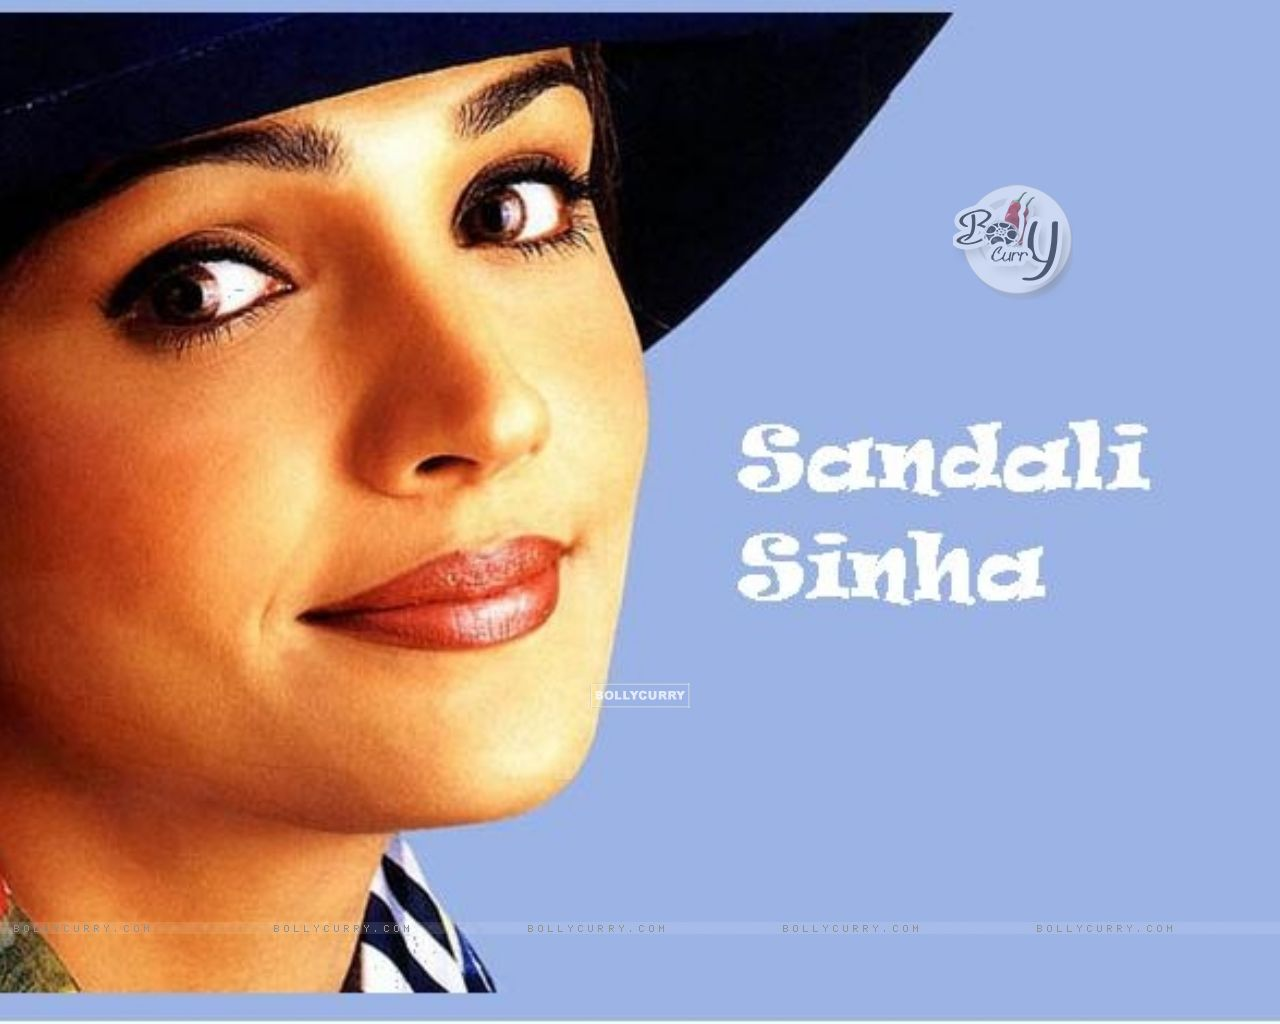 pictures Sandali Sinha